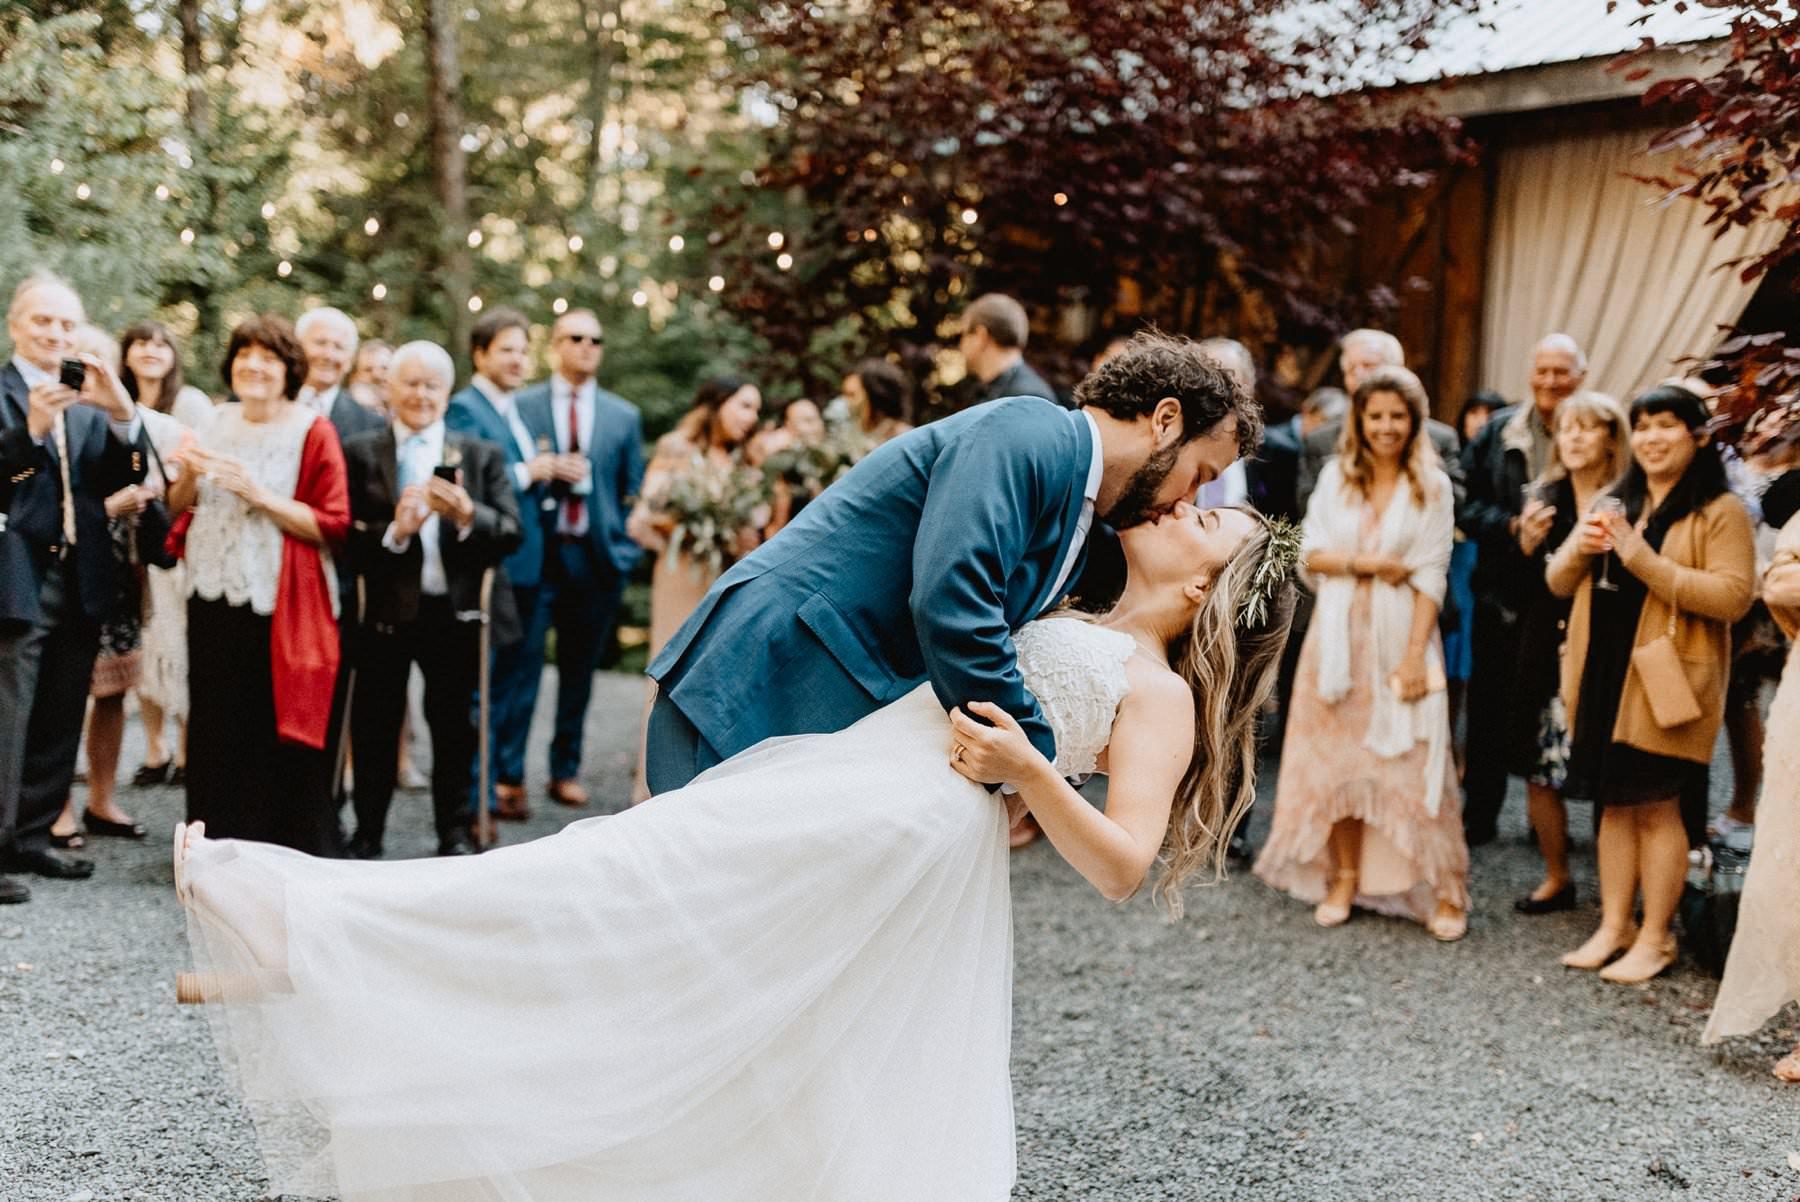 059-Tall-timber-barn-wedding-70.jpg